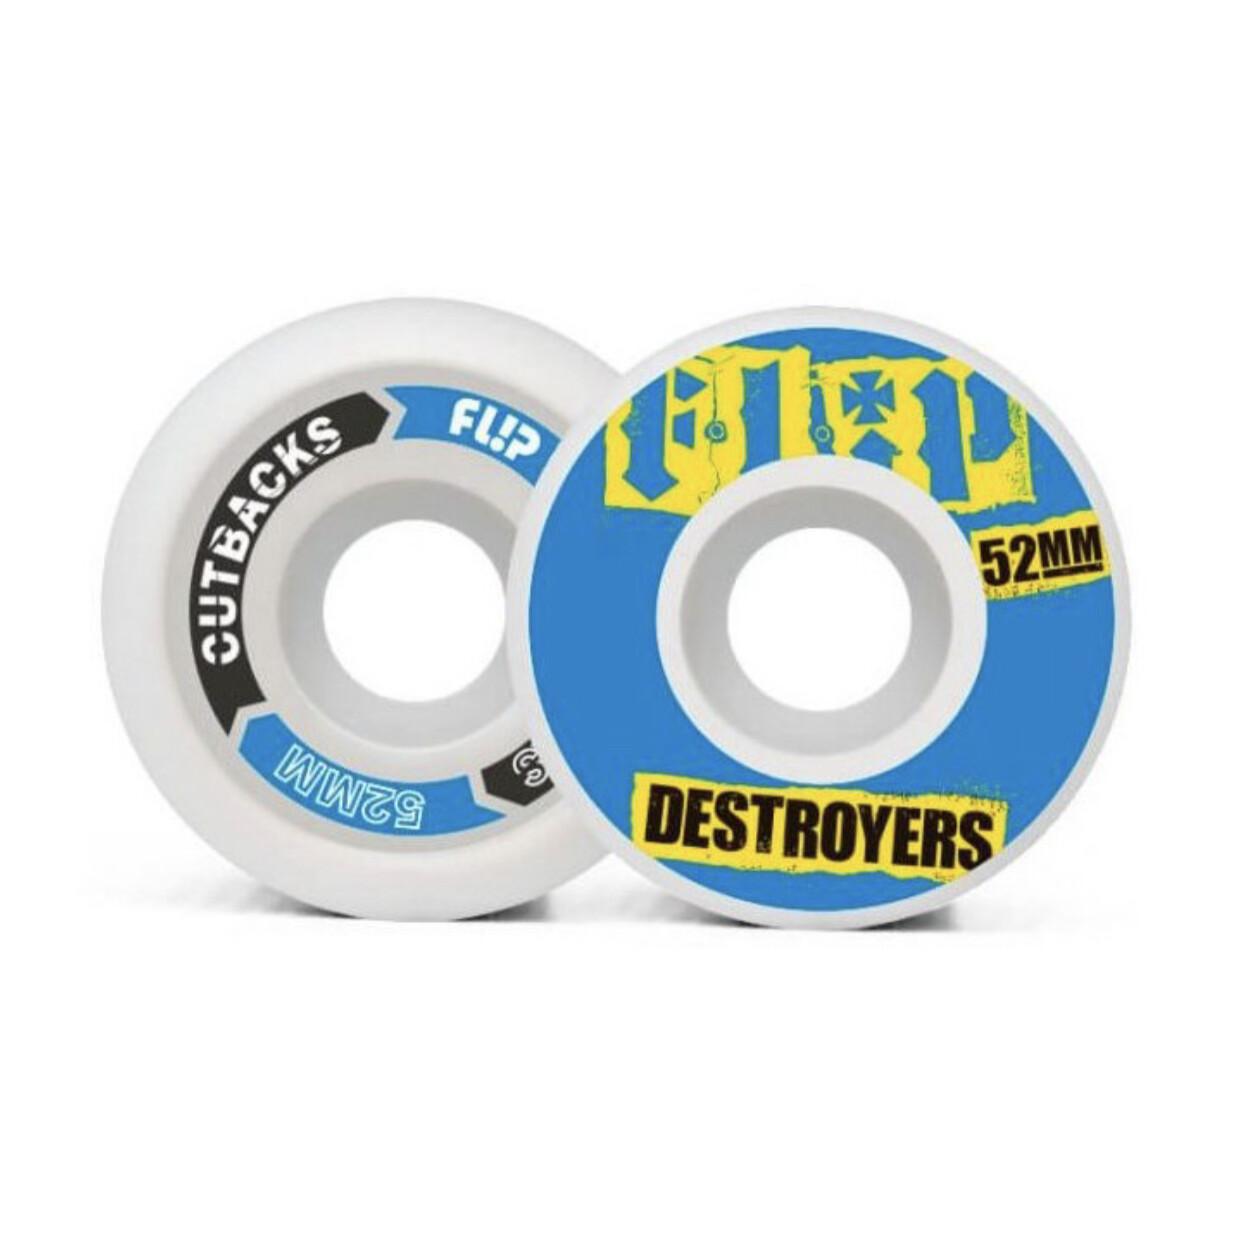 Flip Cutback Destroyers 52mm 99a Blue wheels pack